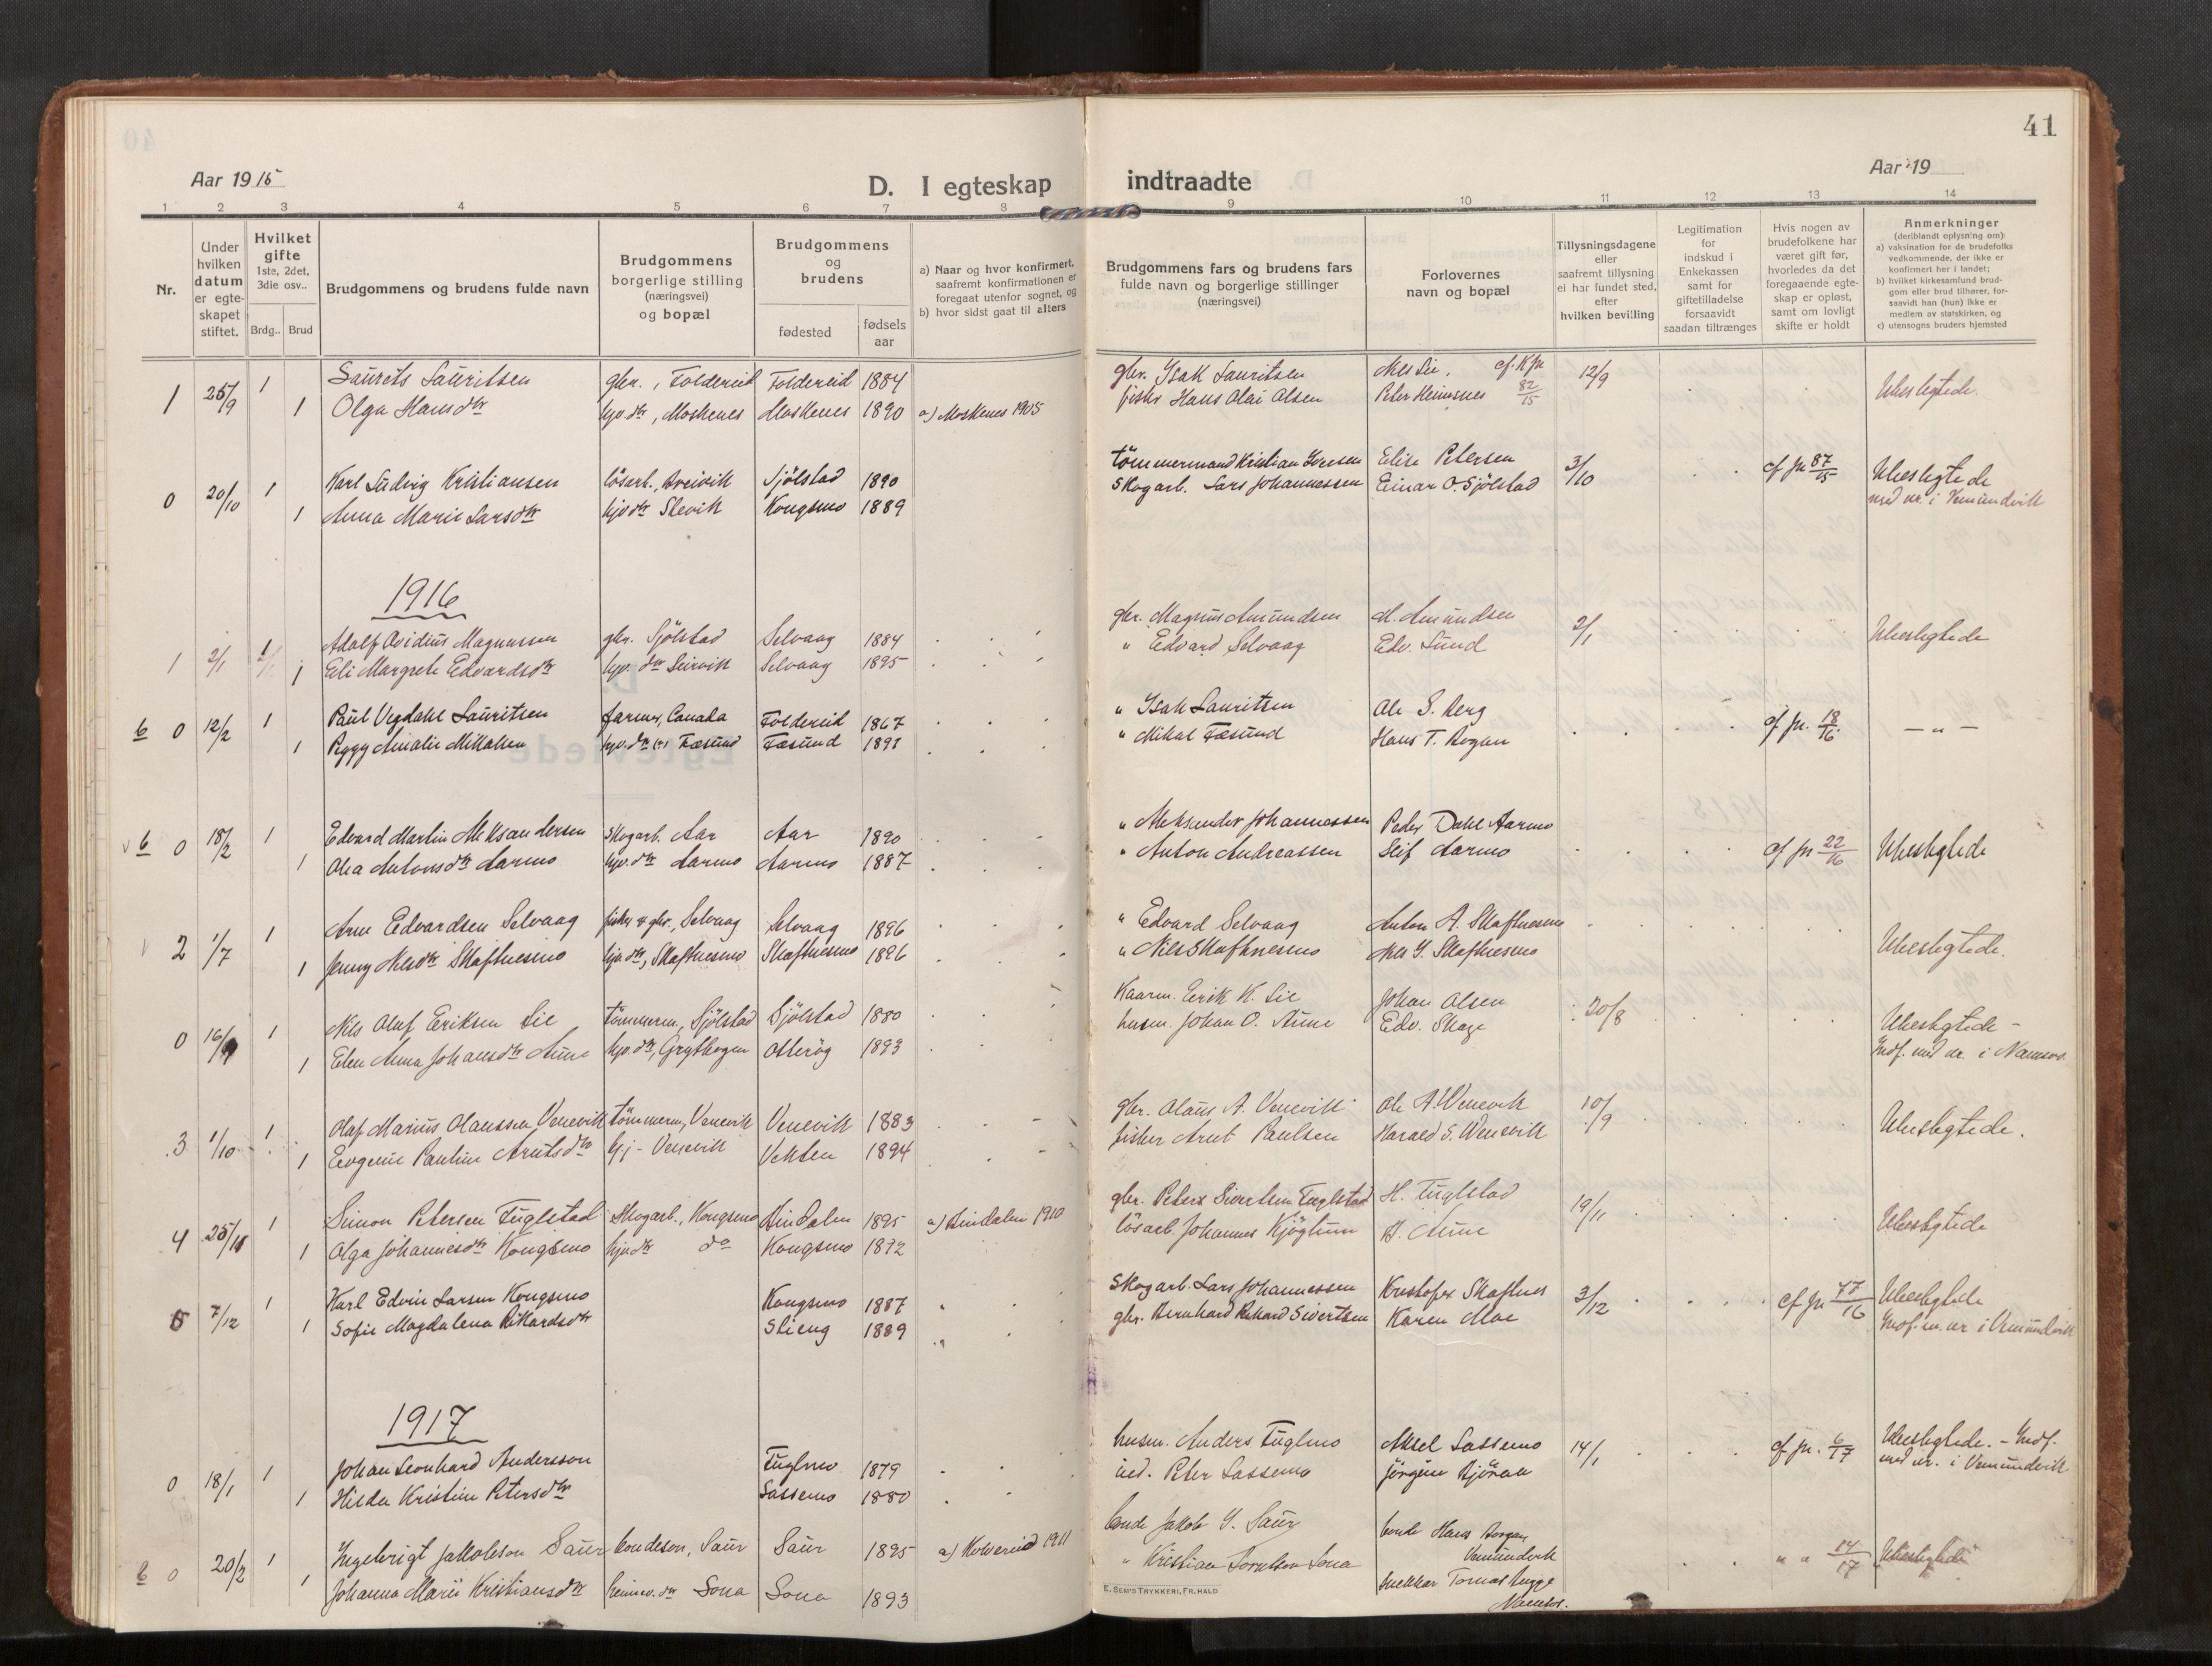 SAT, Kolvereid sokneprestkontor, H/Ha/Haa/L0002: Ministerialbok nr. 2, 1914-1926, s. 41